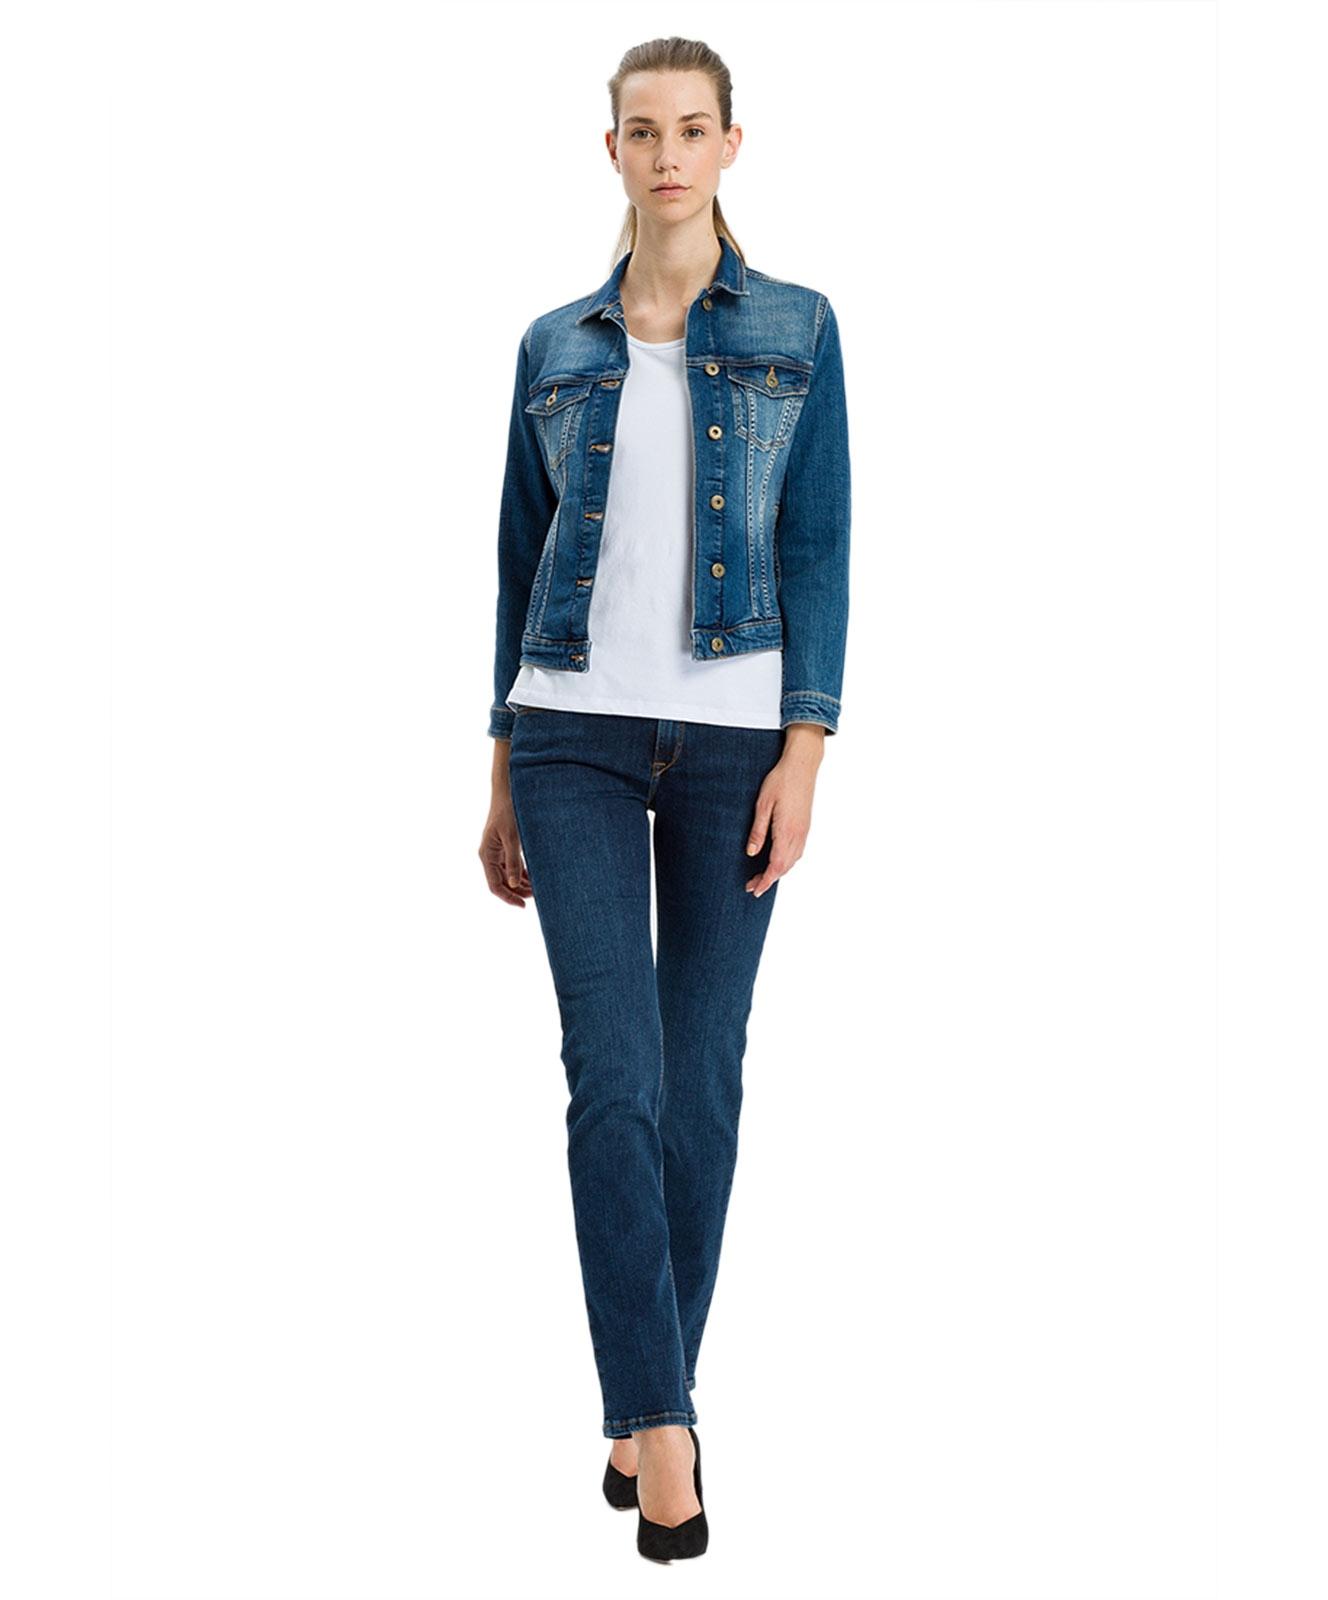 Hosen - Cross Straight Leg Jeans Rose in Dark Used  - Onlineshop Jeans Meile